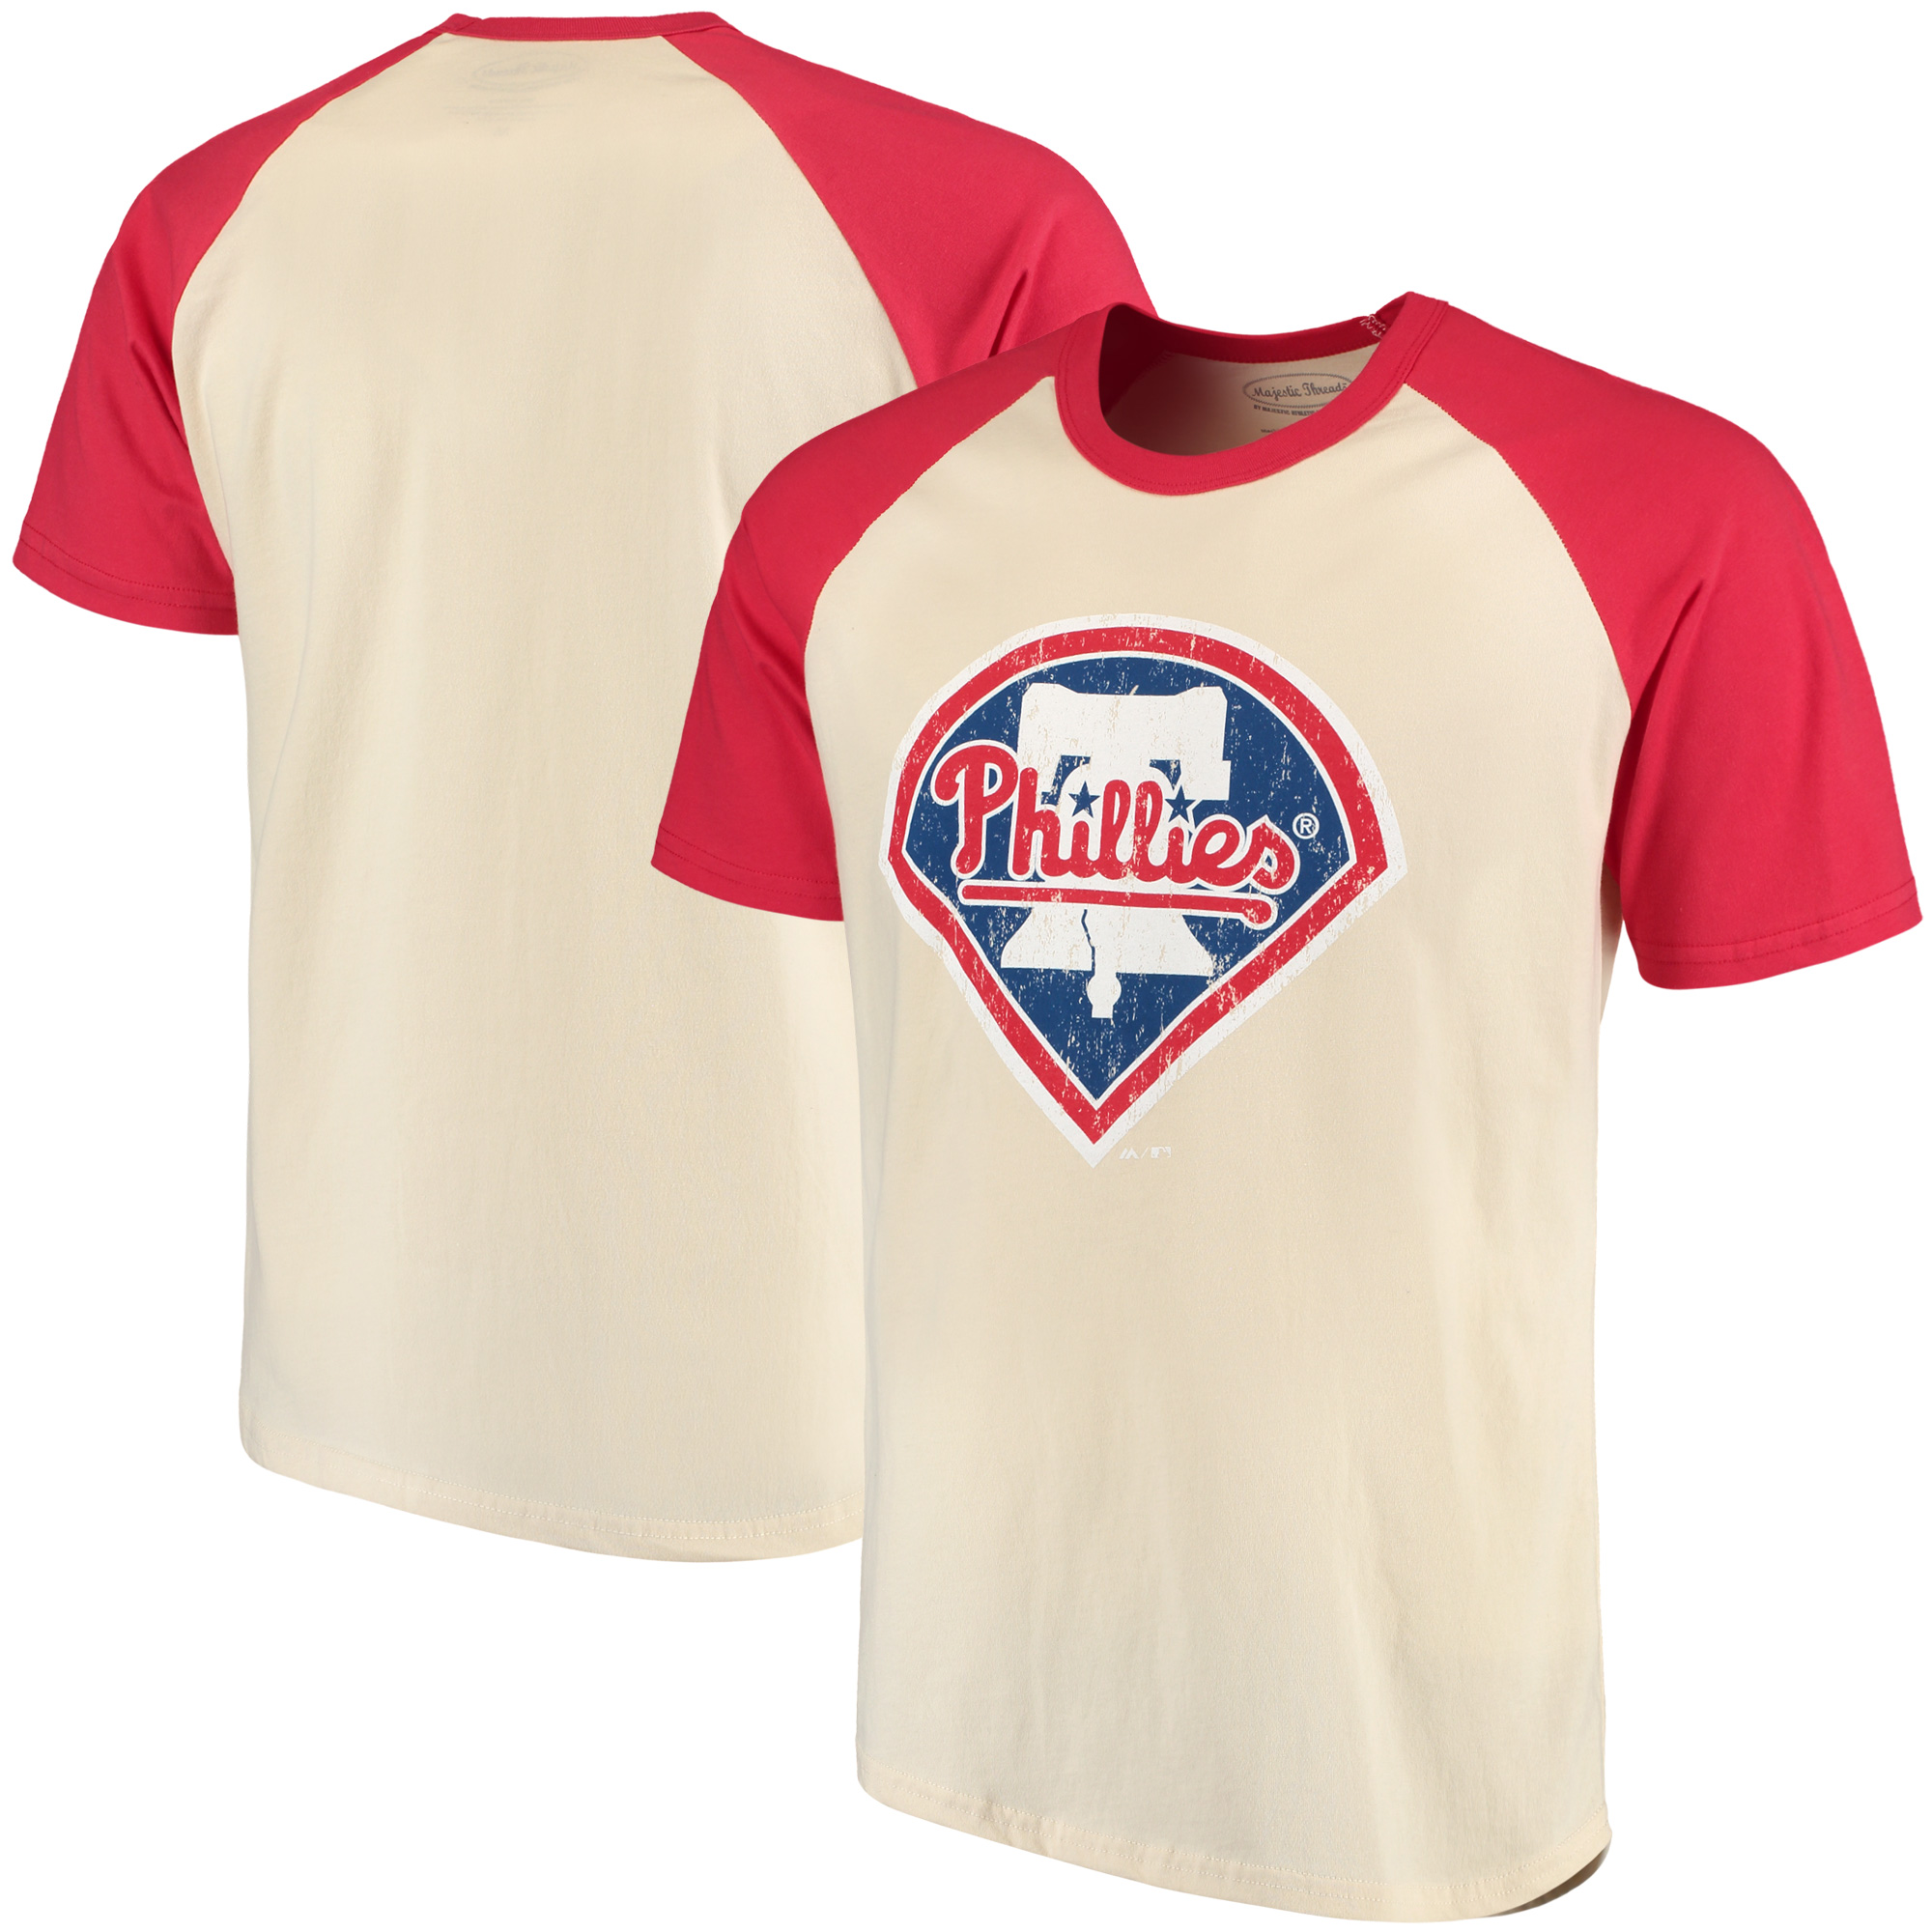 Philadelphia Phillies Majestic Threads Softhand Raglan T-Shirt - Cream/Red